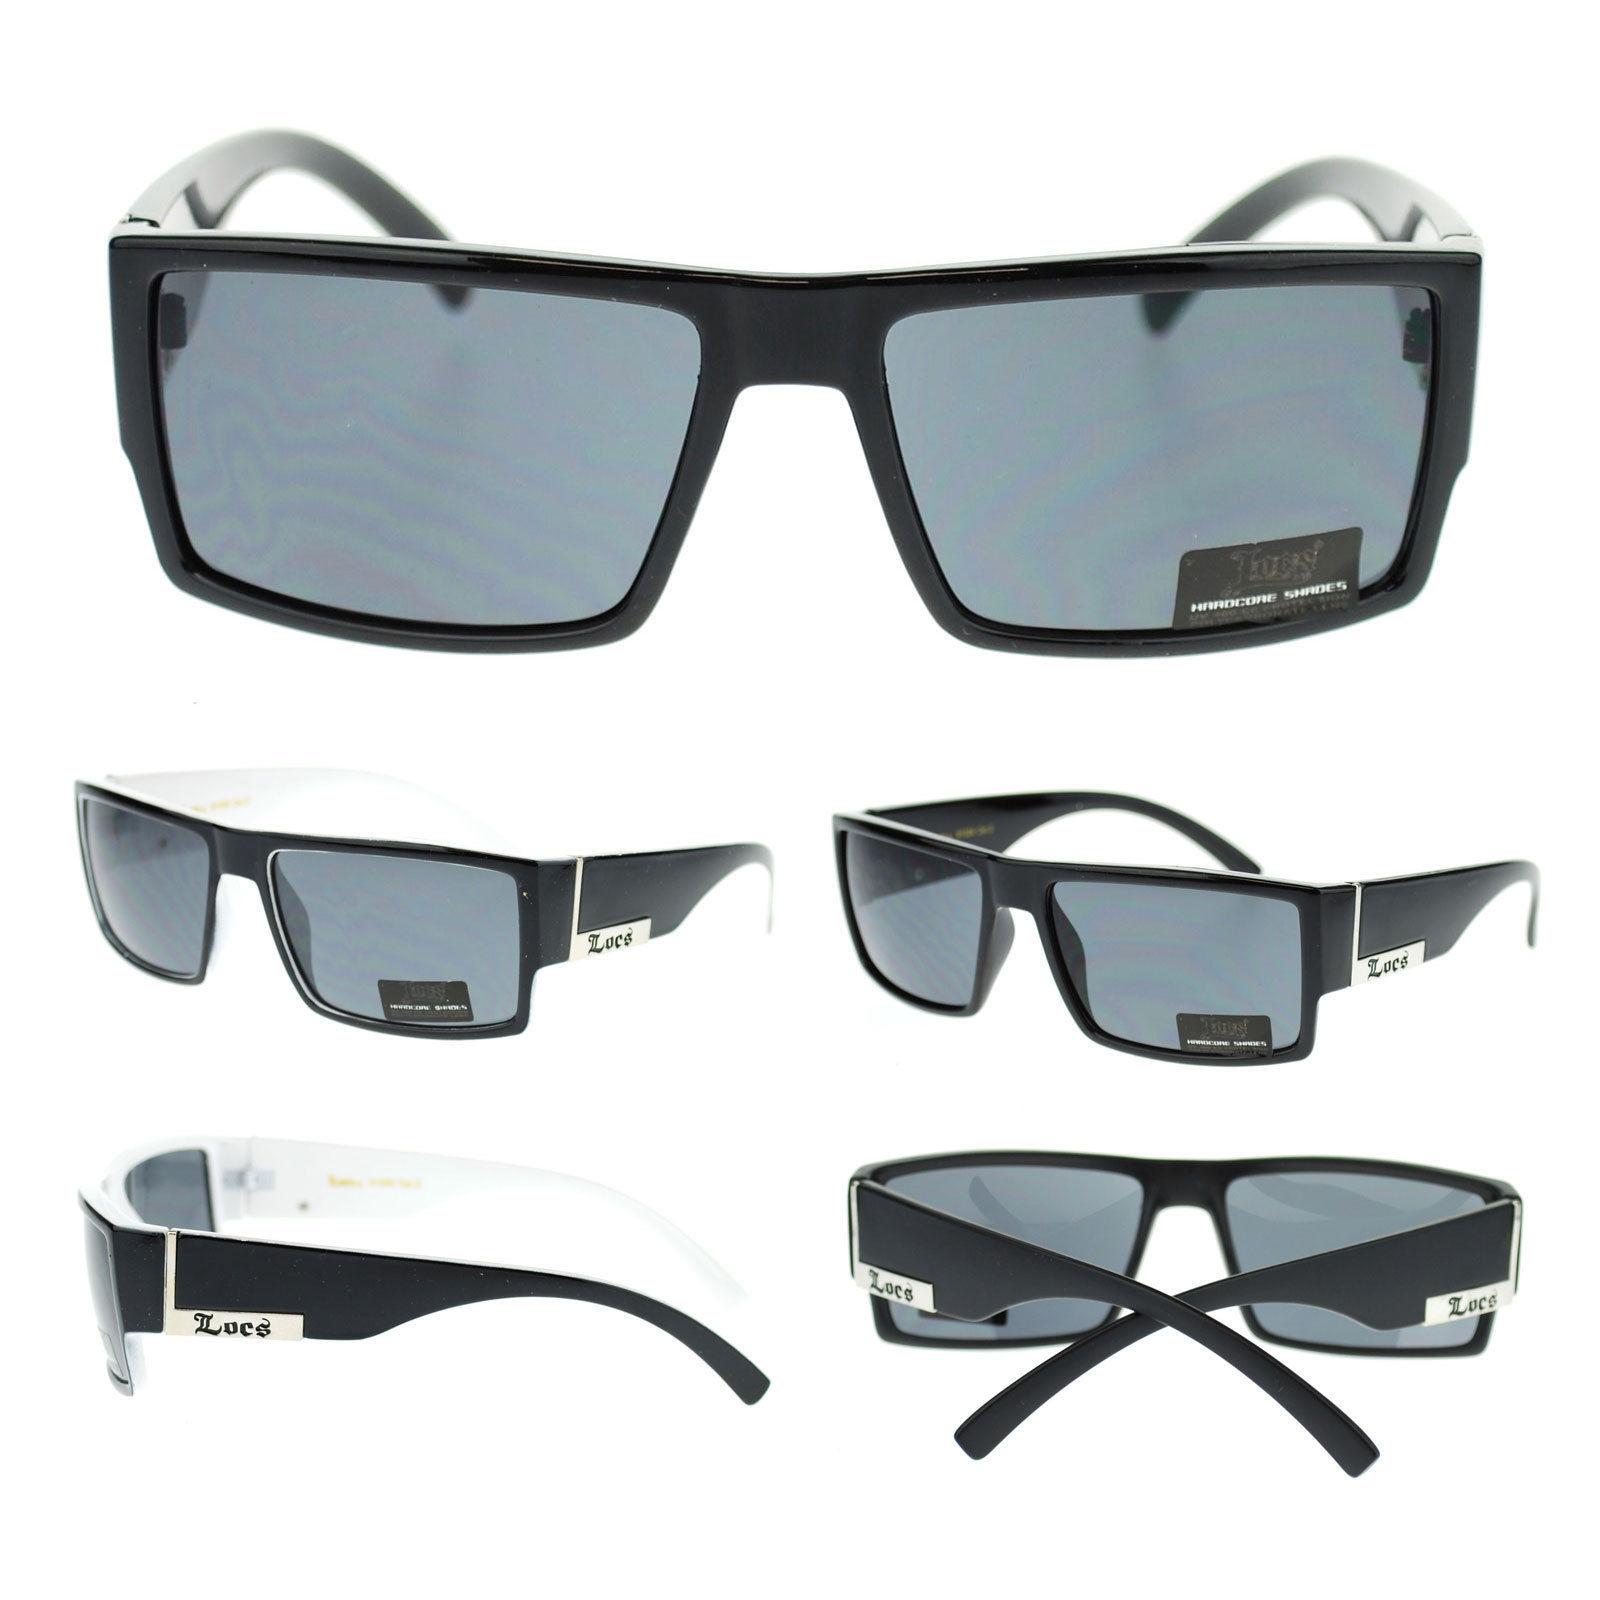 c977b7161224 Locs Black Mens Hardcore Gangster Rectangular Plastic Biker Sport New  Sunglasses - $9.95